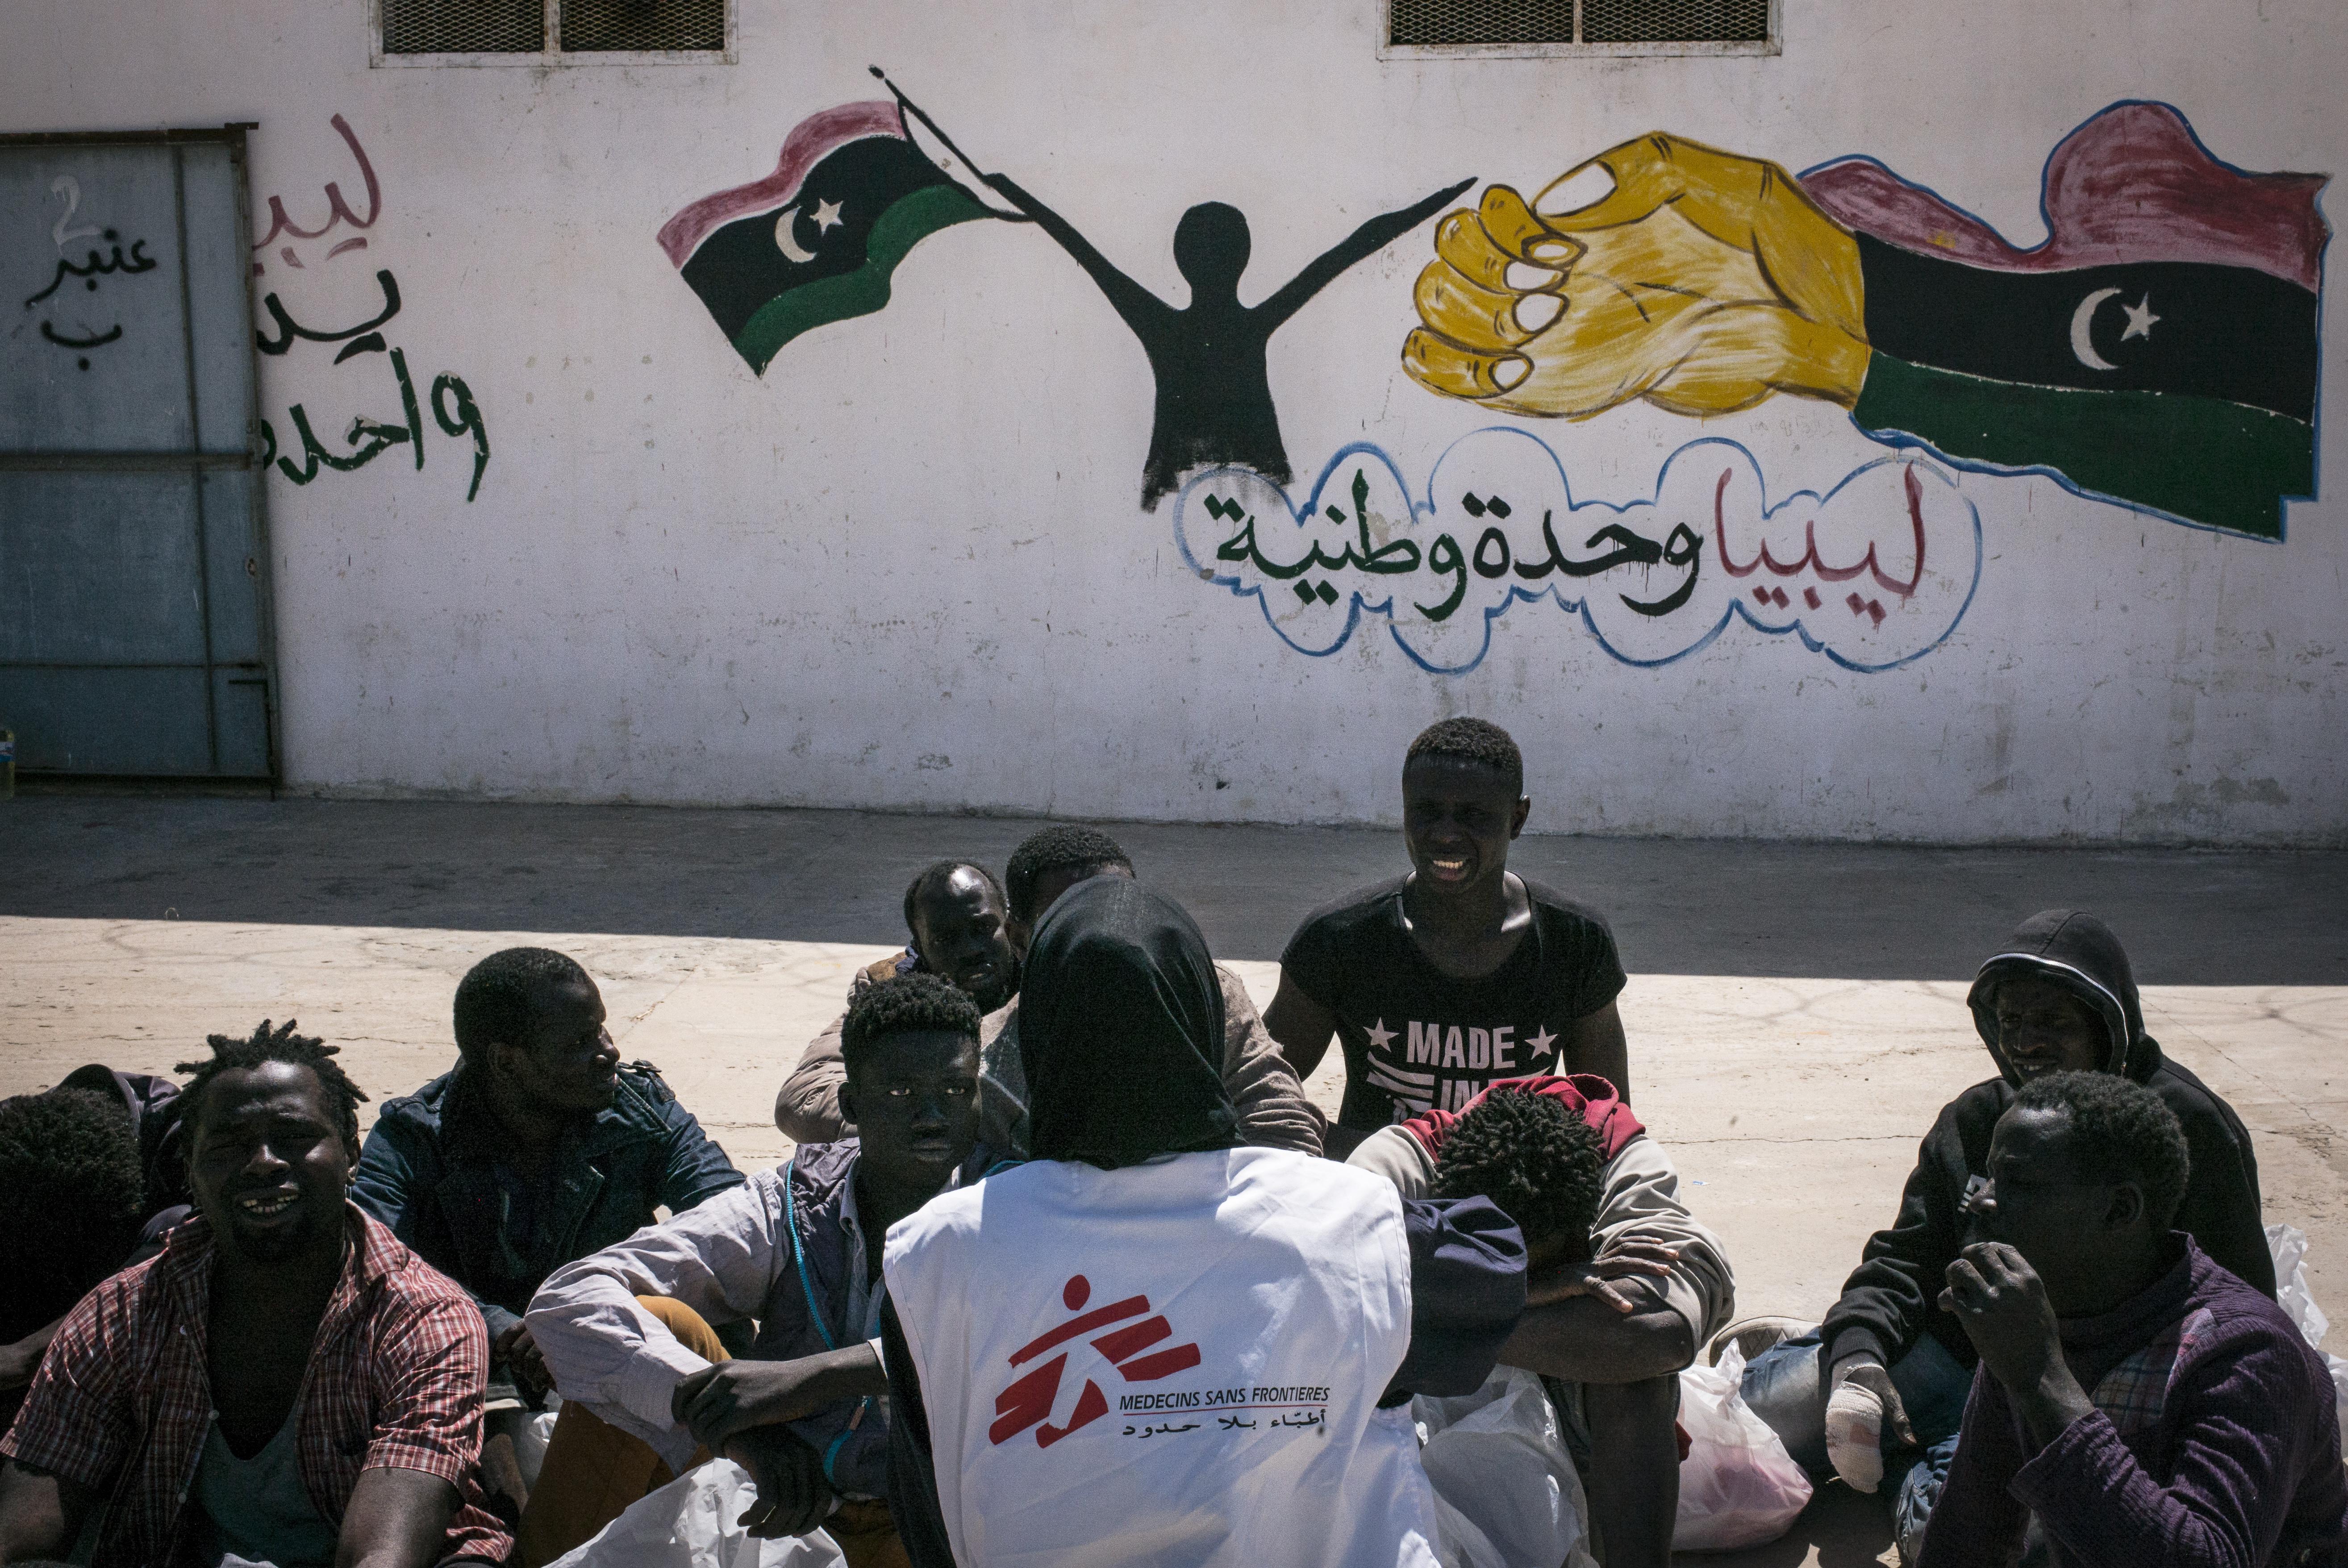 Libya migrant refugee detainee detention